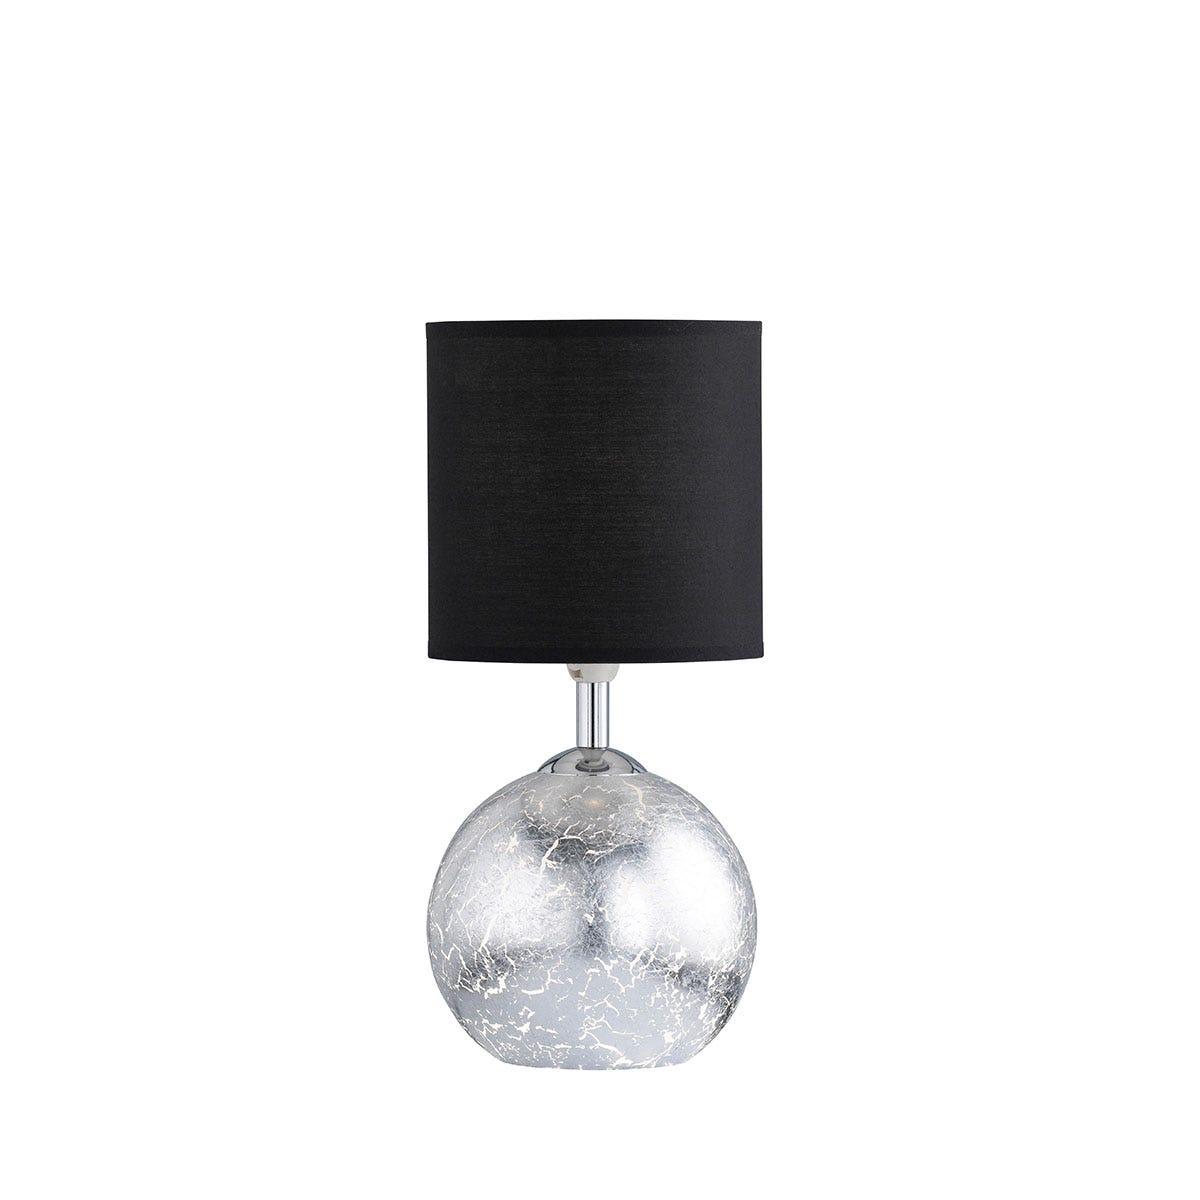 Wofi Carmen Table Lamp - Silver Black Shade